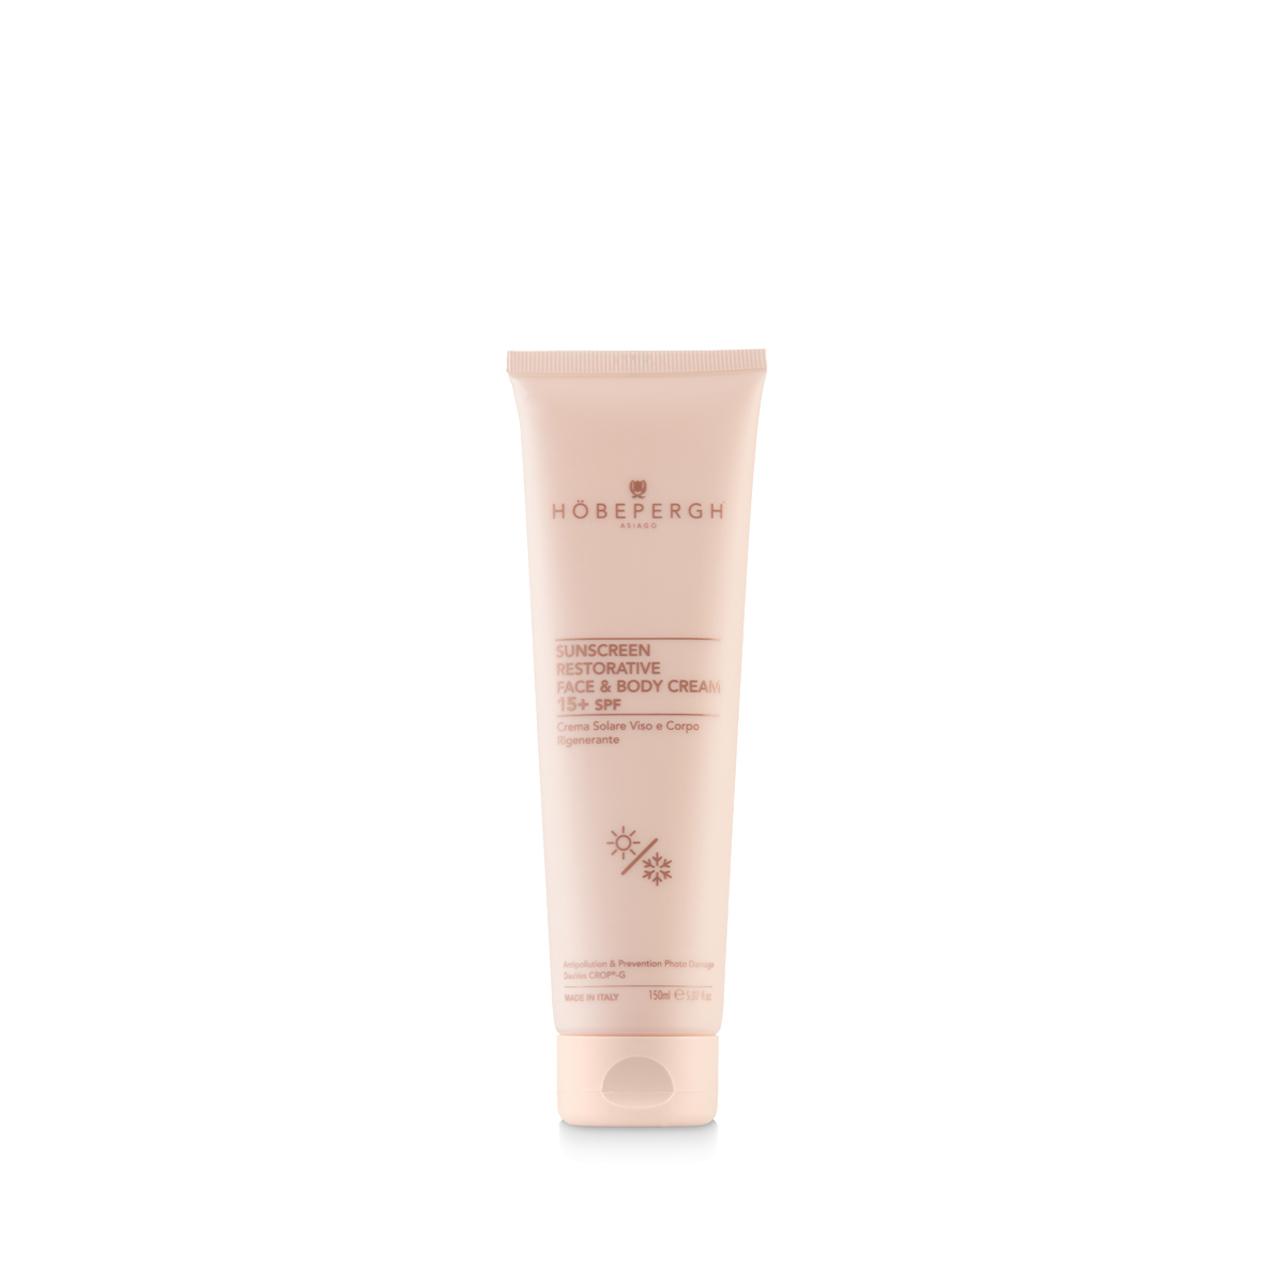 Sunscreen Restorative Face & Body Cream SPF 15+